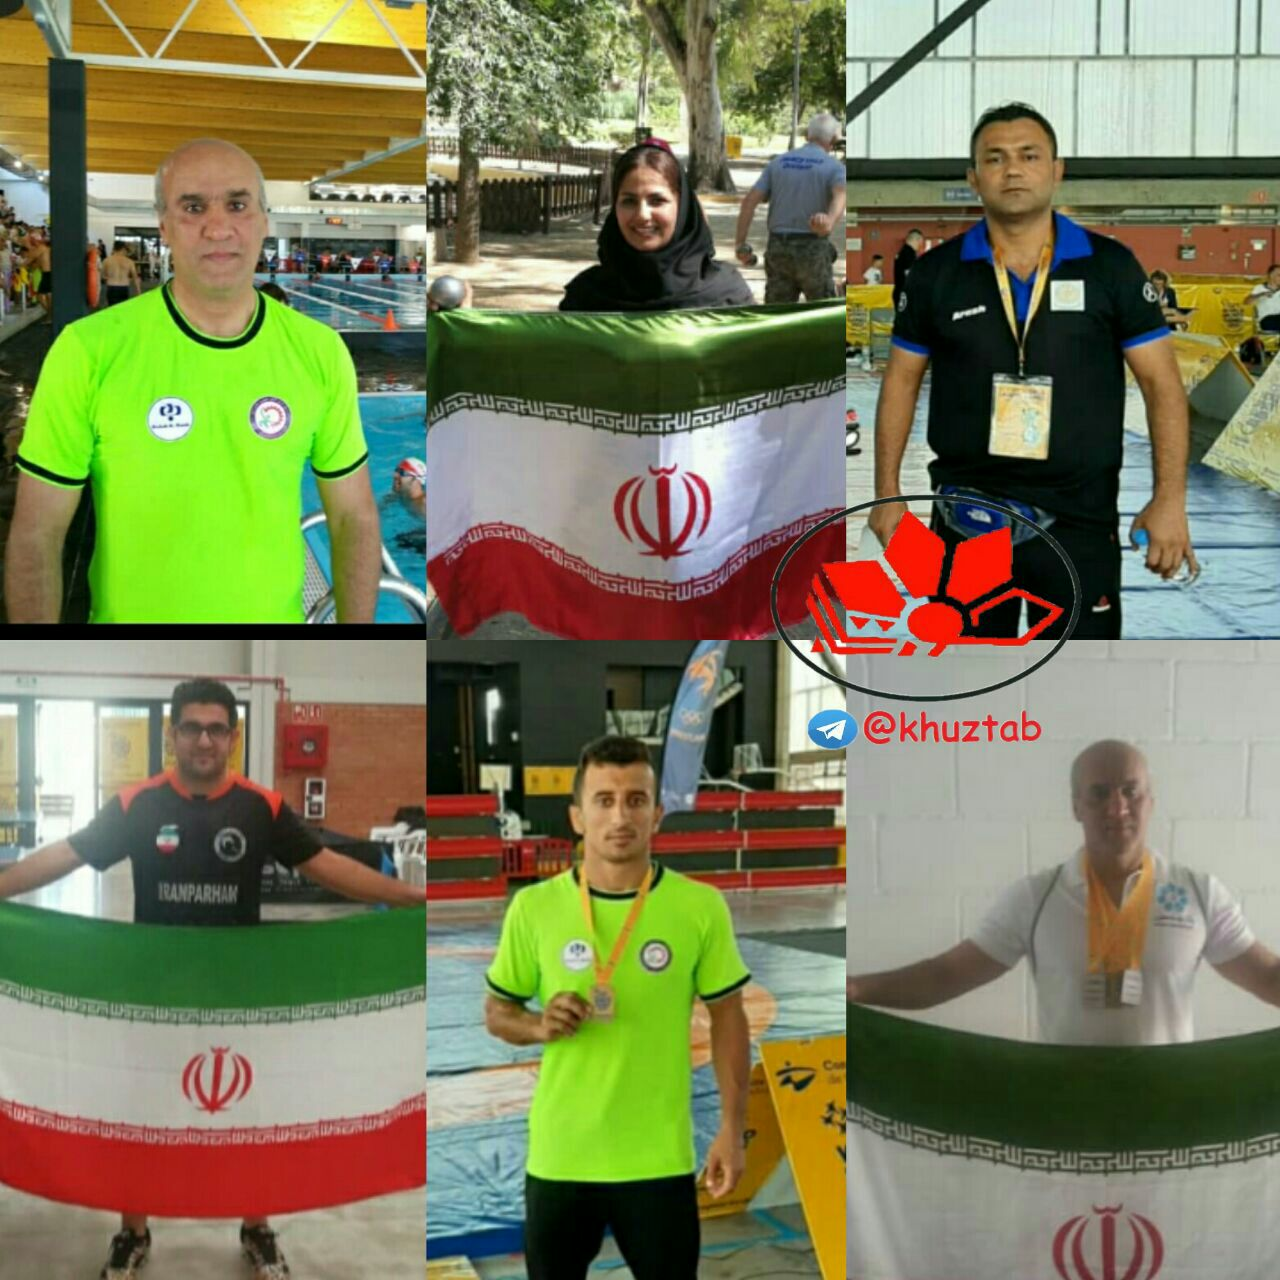 IMG 20190706 224450 594 درخشش کارگران ورزشکار خوزستانی در مسابقات جهانی اسپانیا با کسب ۱۸ مدال رنگارنگ